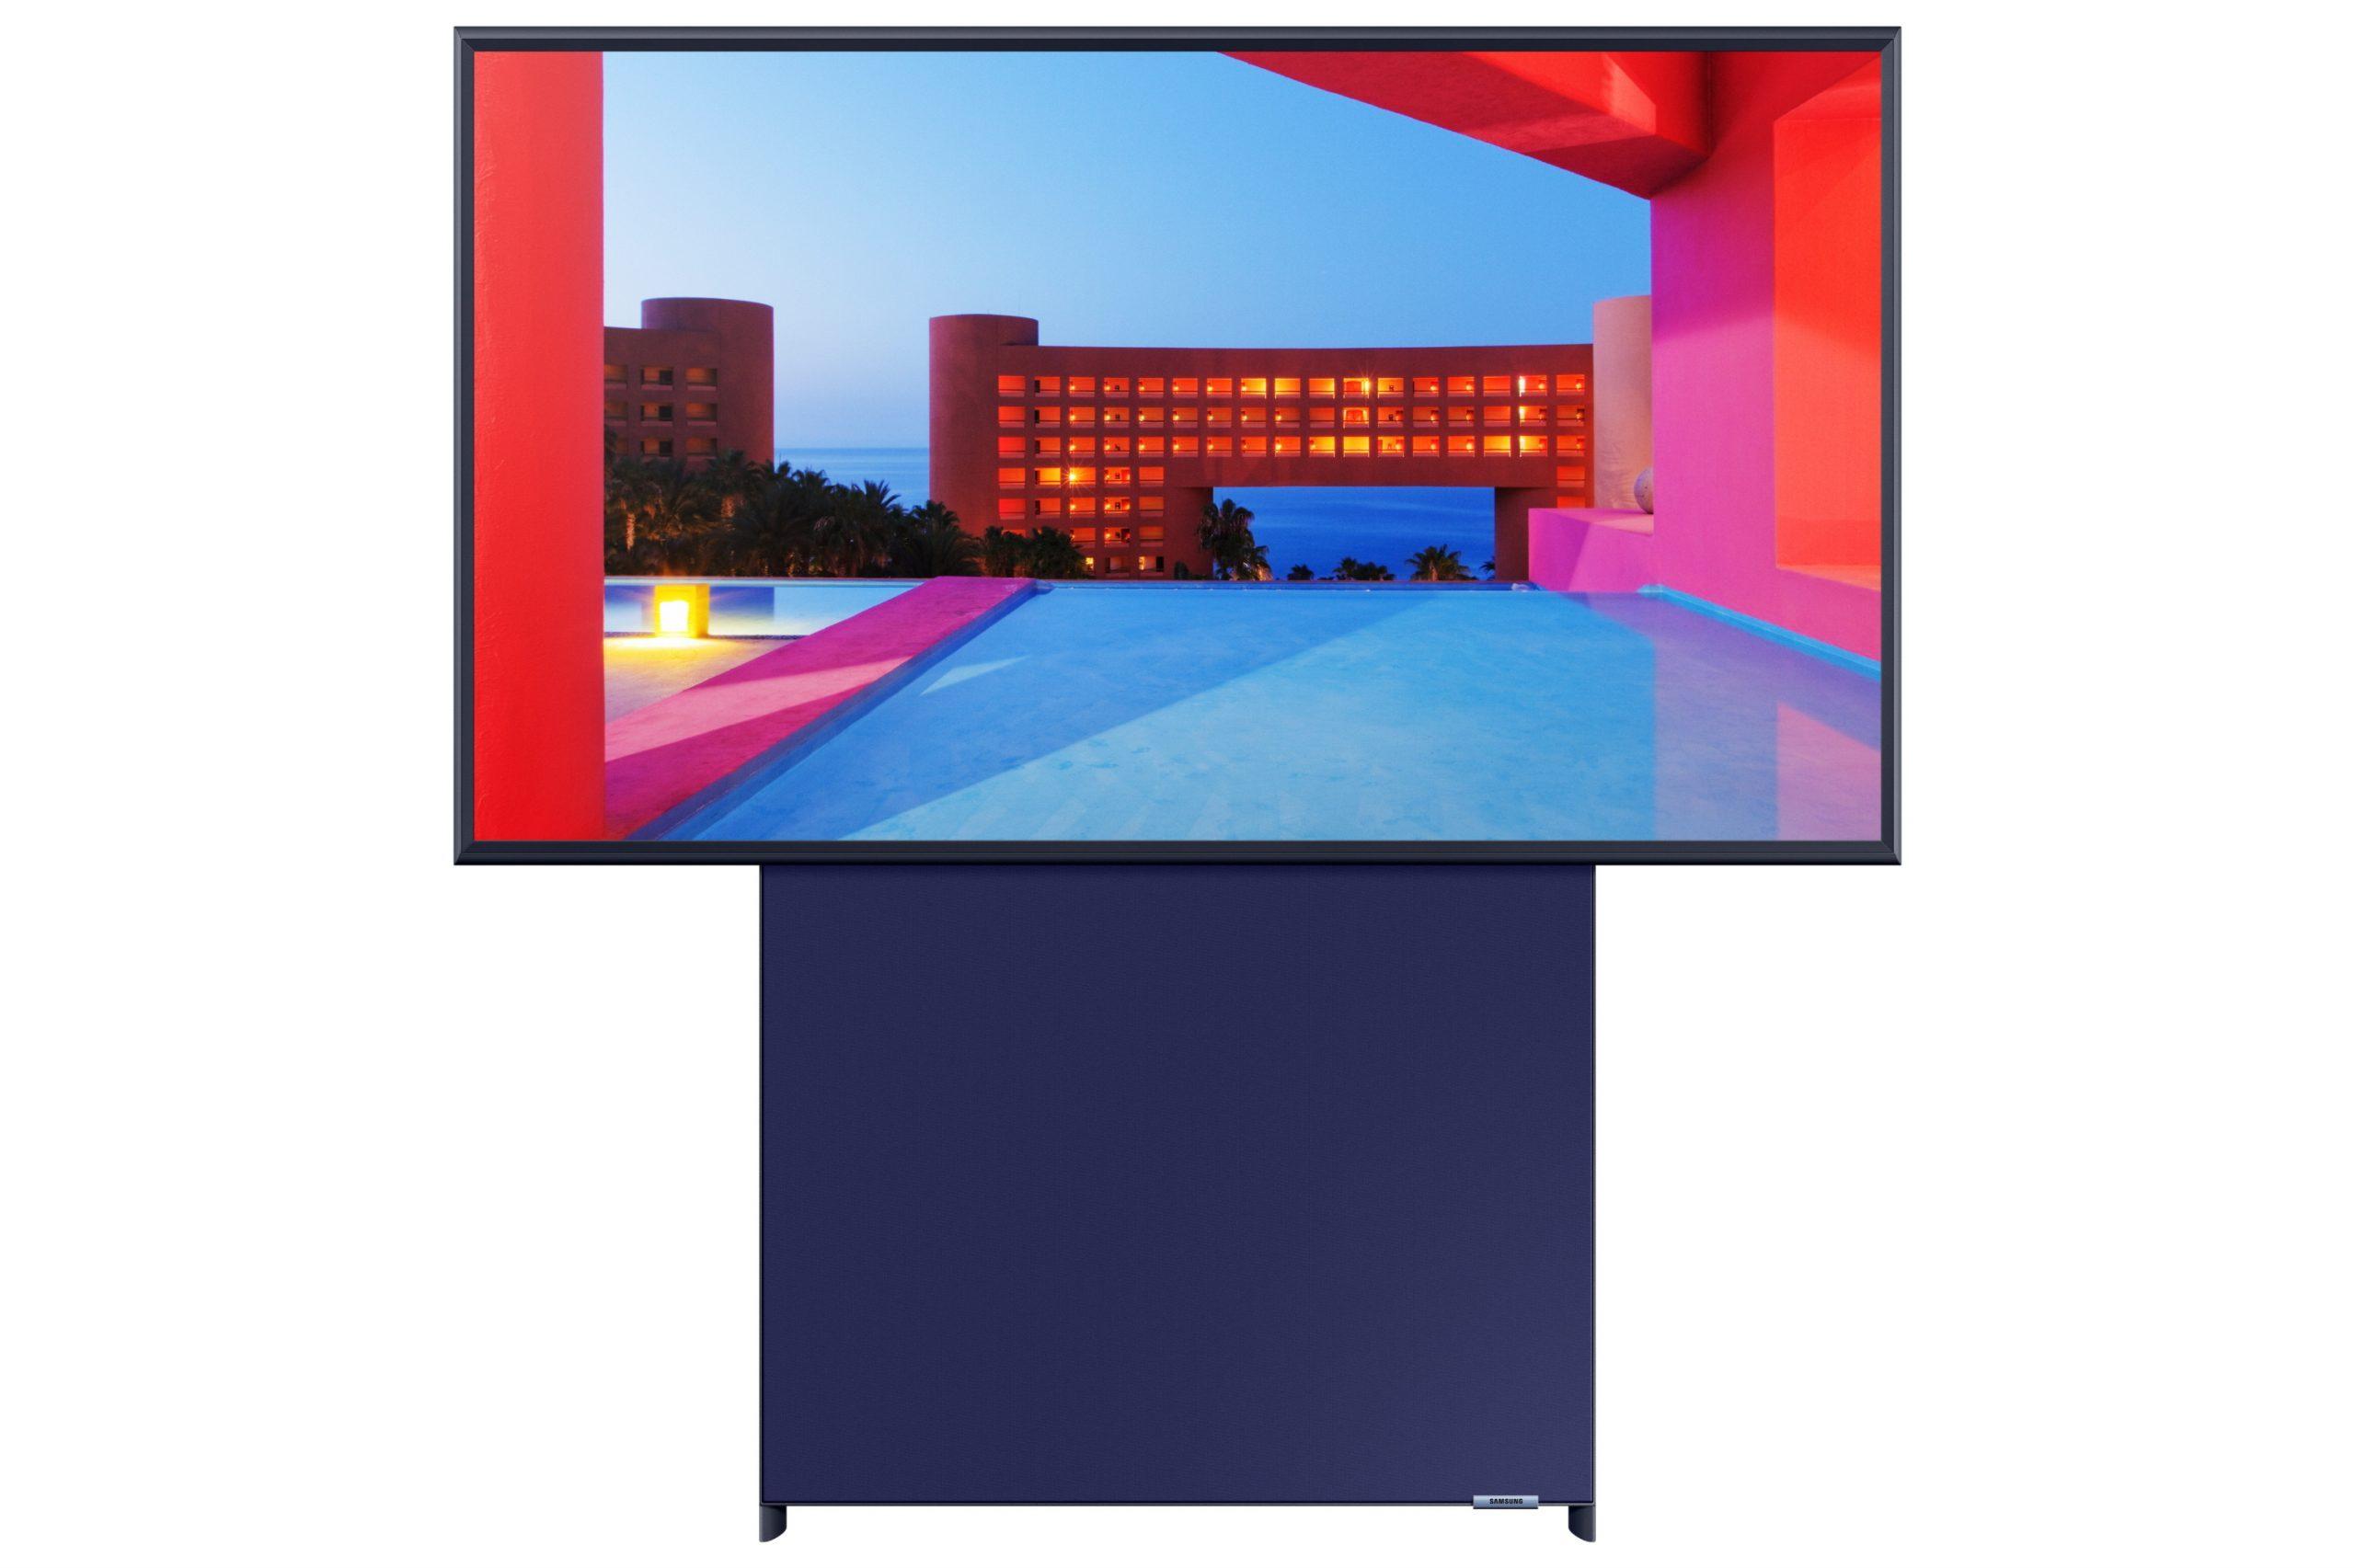 Samsung-Lifestyle-TV-The-Sero-03 (1)